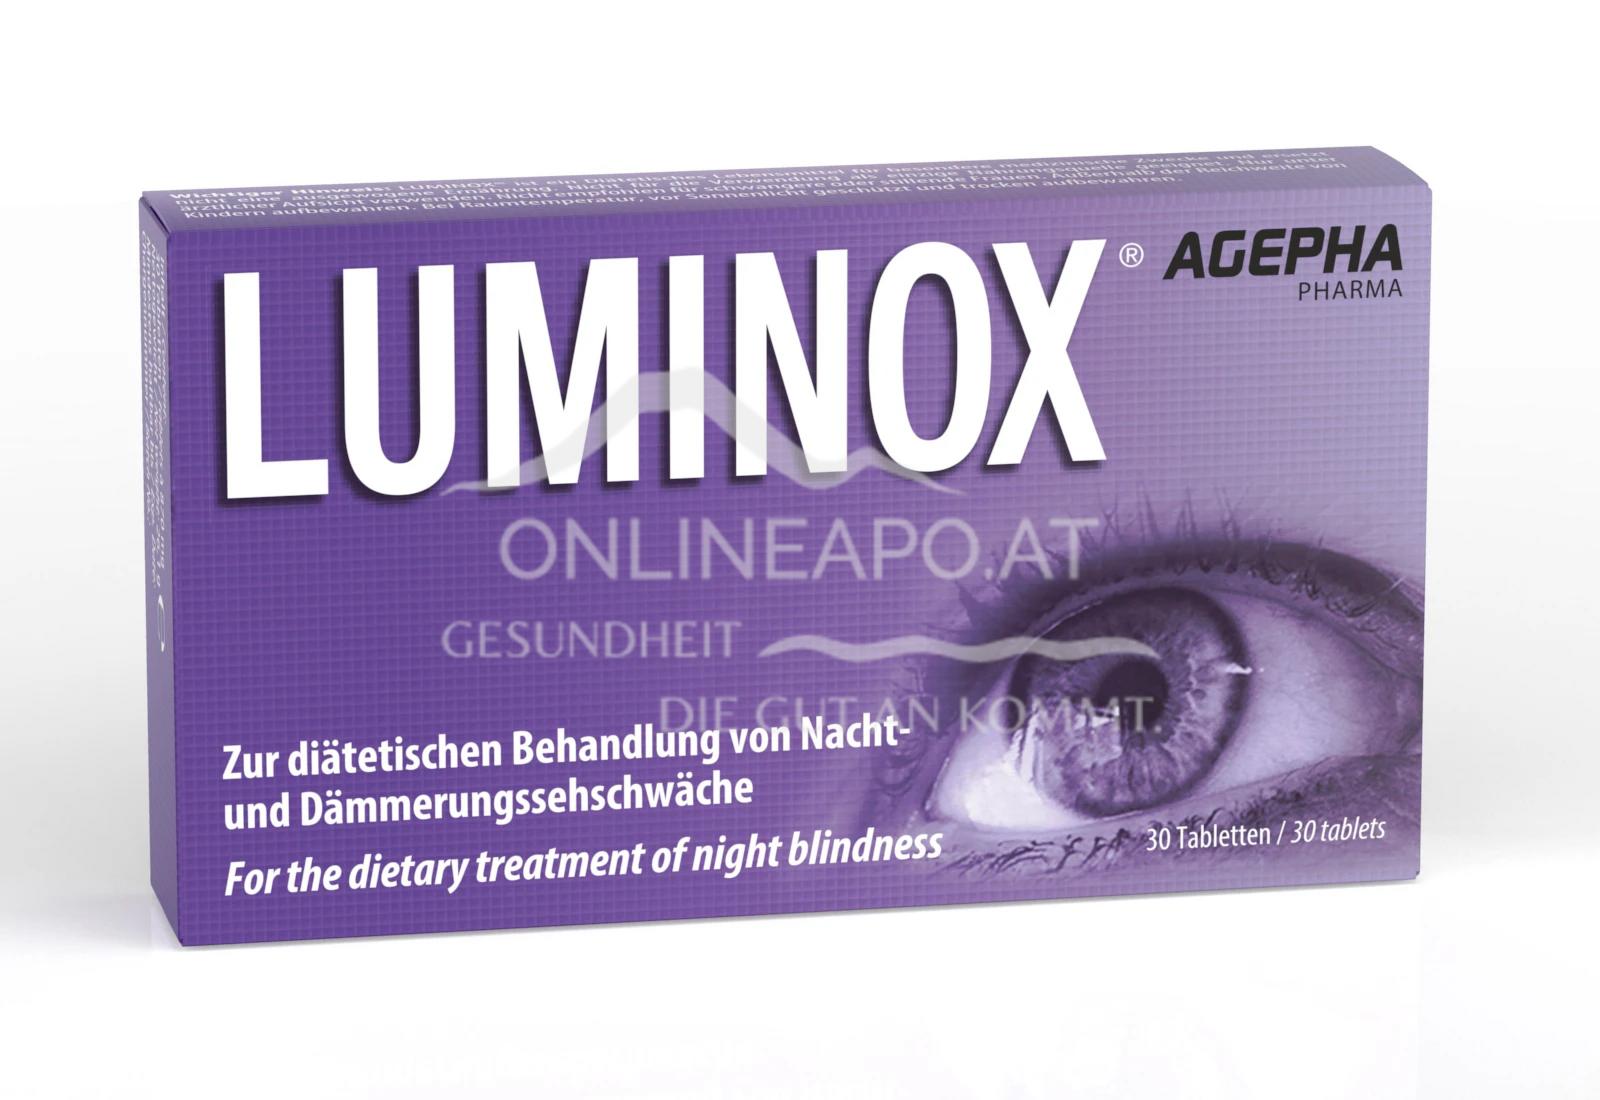 Luminox®